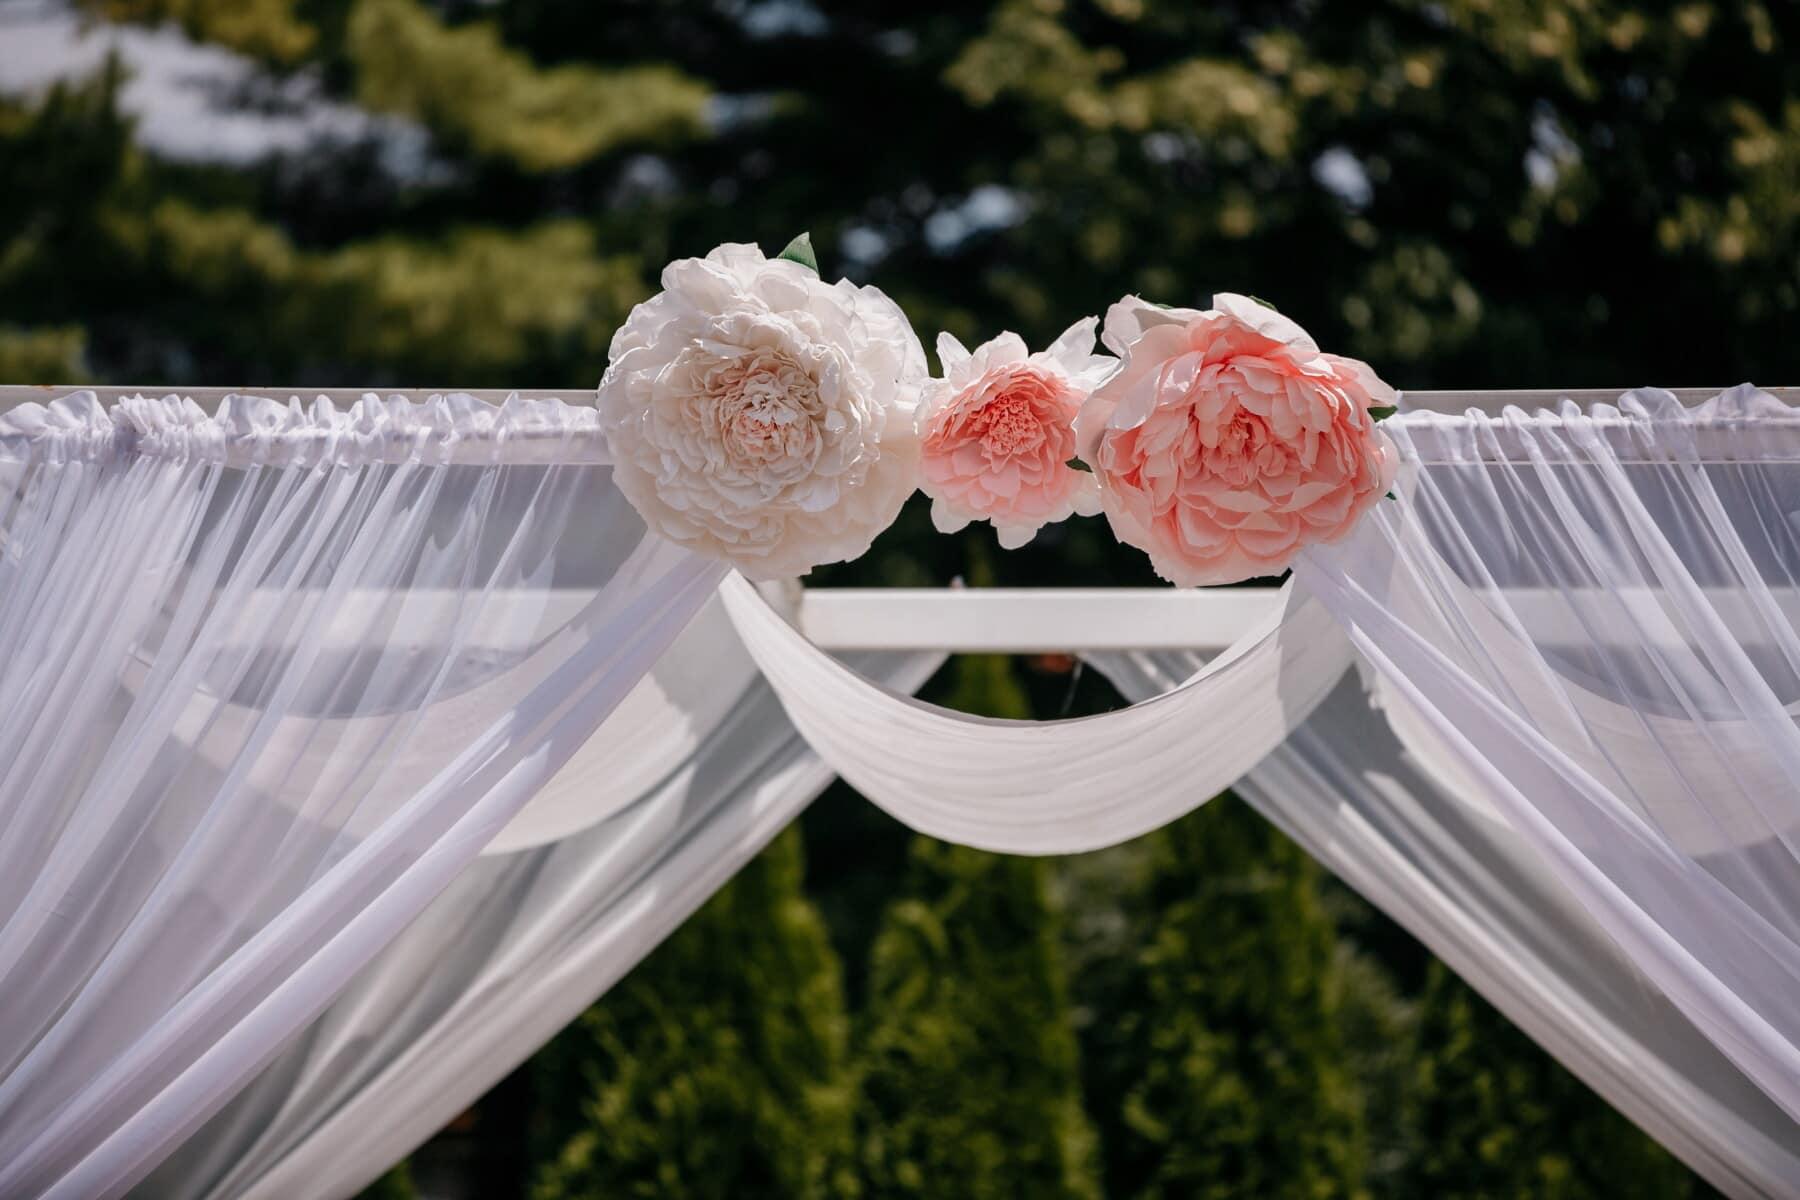 decoration, curtain, wedding venue, arrangement, wedding, love, flowers, flower, romance, outdoors